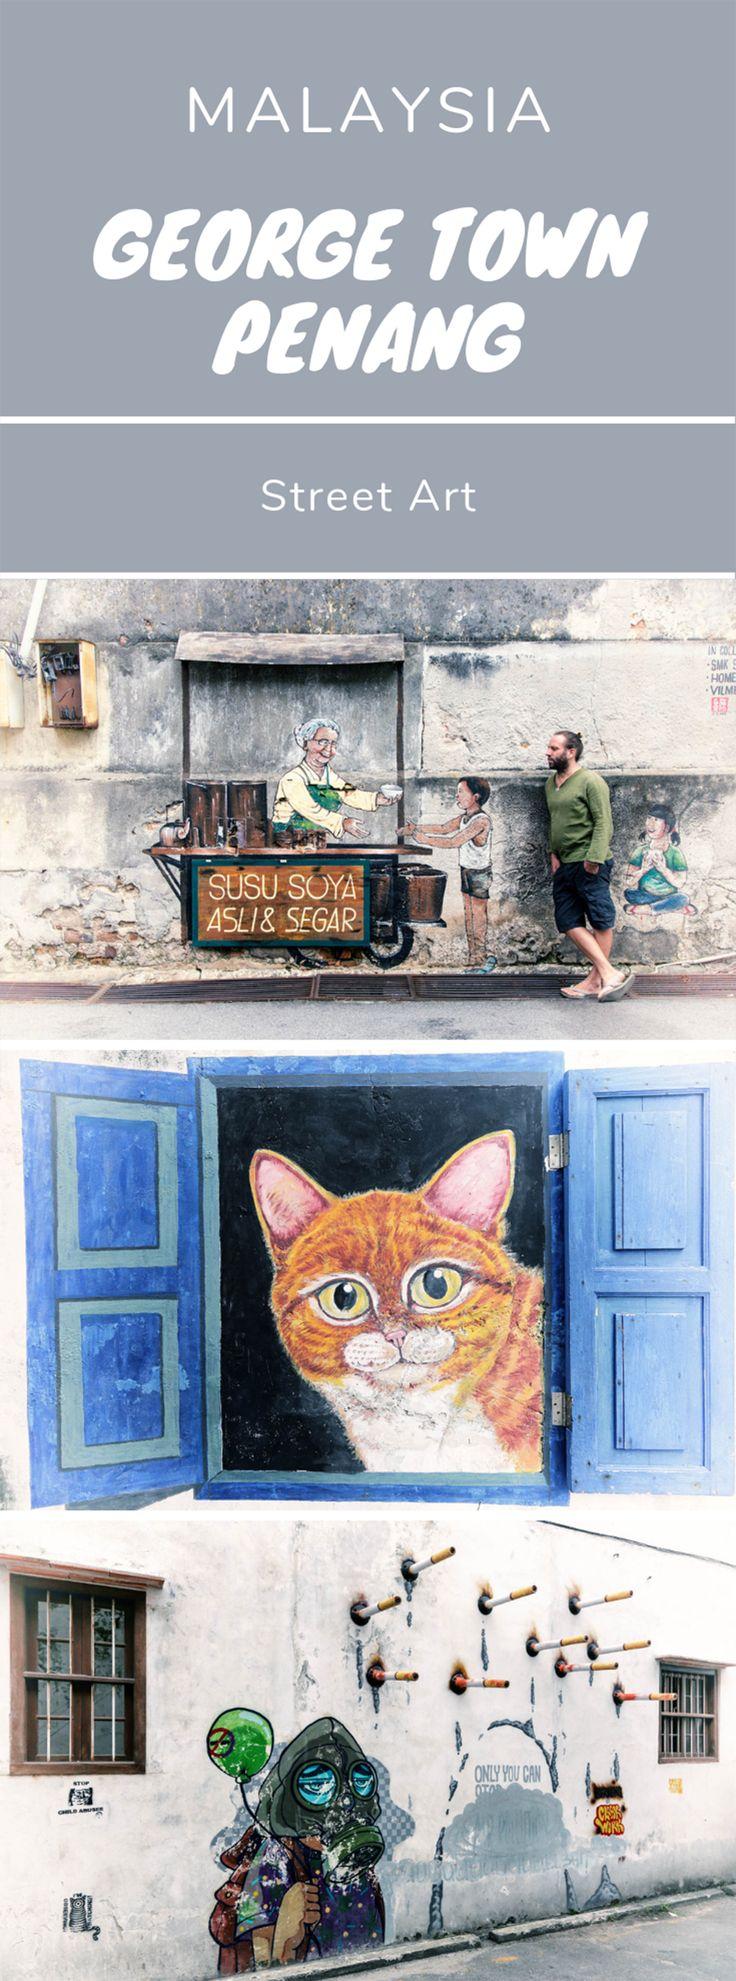 George Town Street Art – Penang, Malaysia